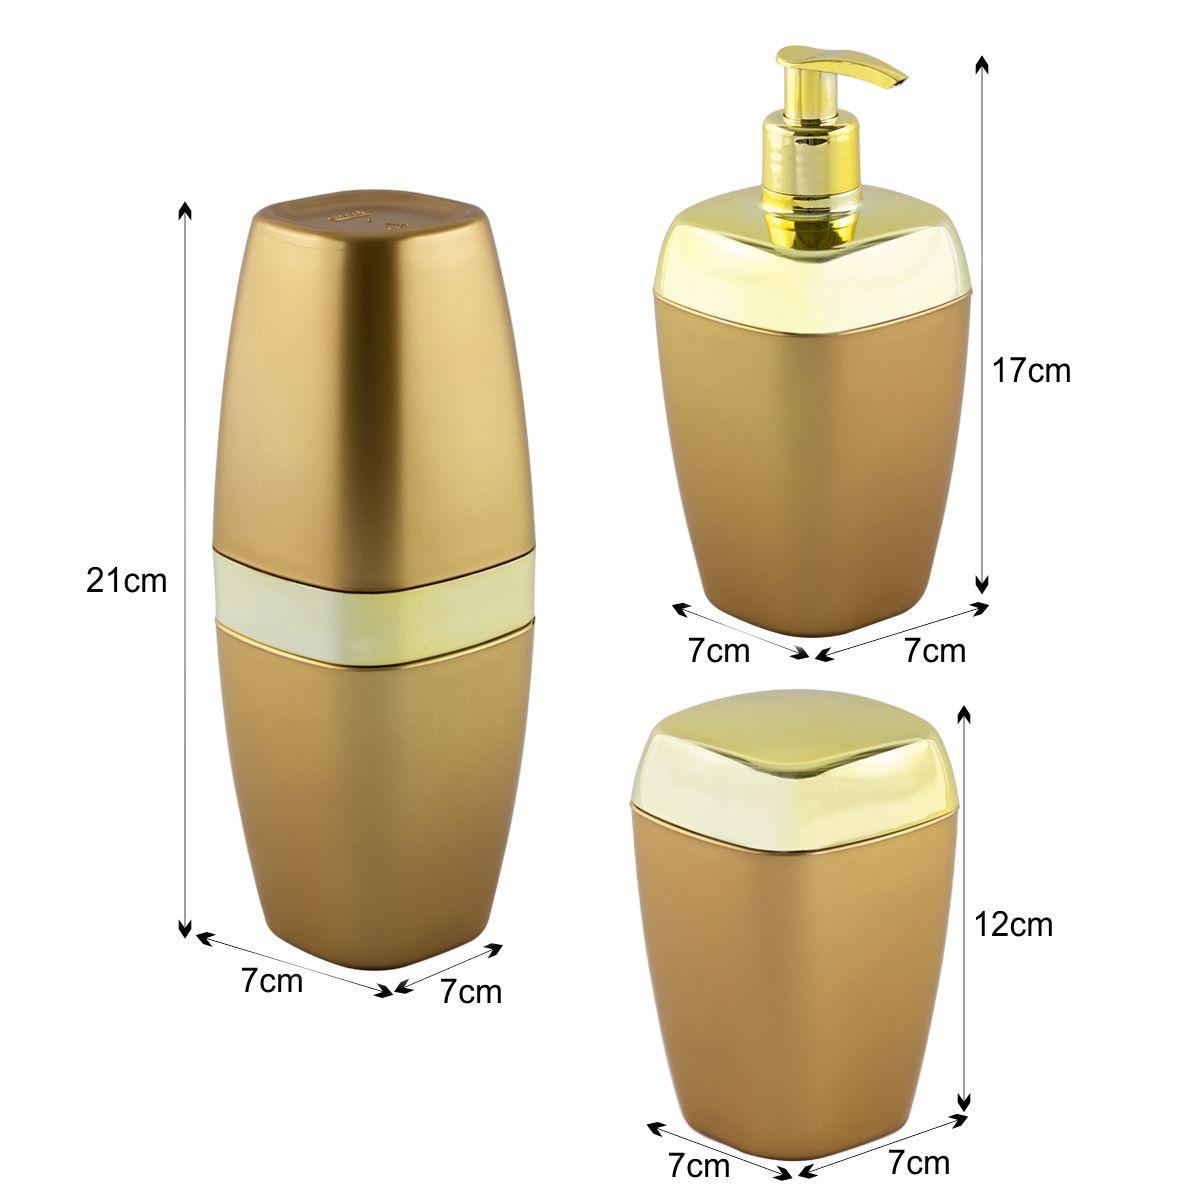 Kit Porta Escova Algodão Sabonete Líquido Lavabo Luxo